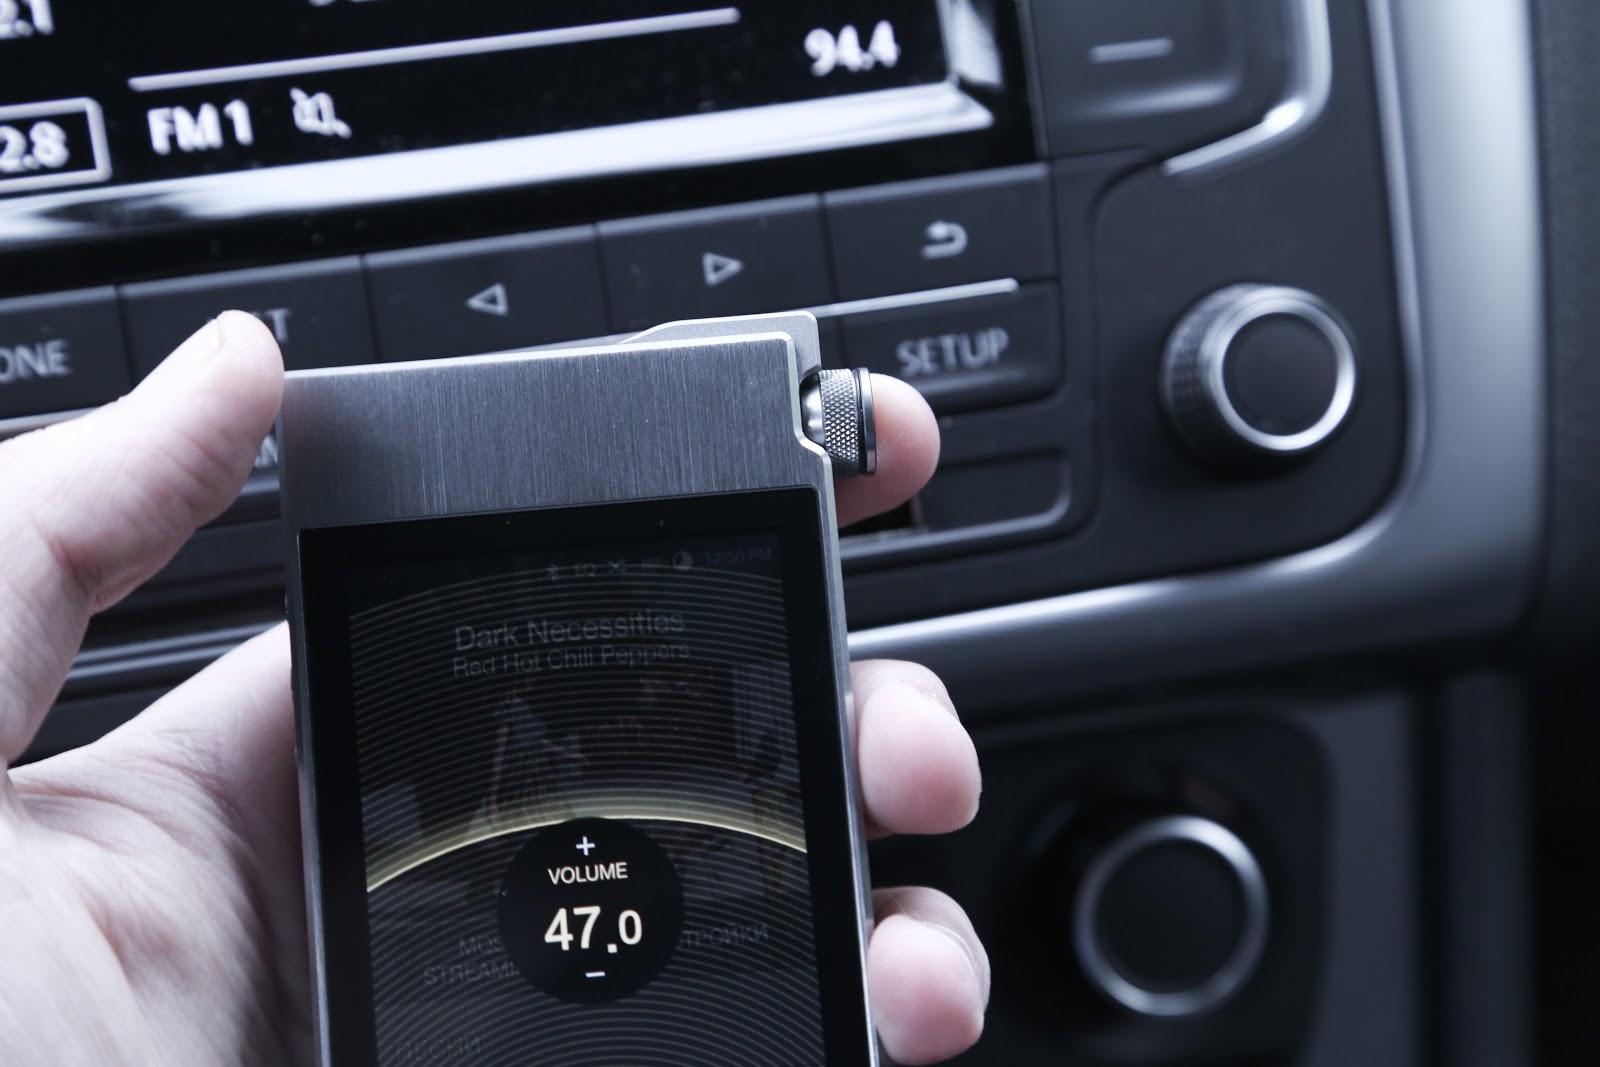 На четырех колесах: аудиоплеер Astell&Kern AK100 II и пульт AK RM01 - 16